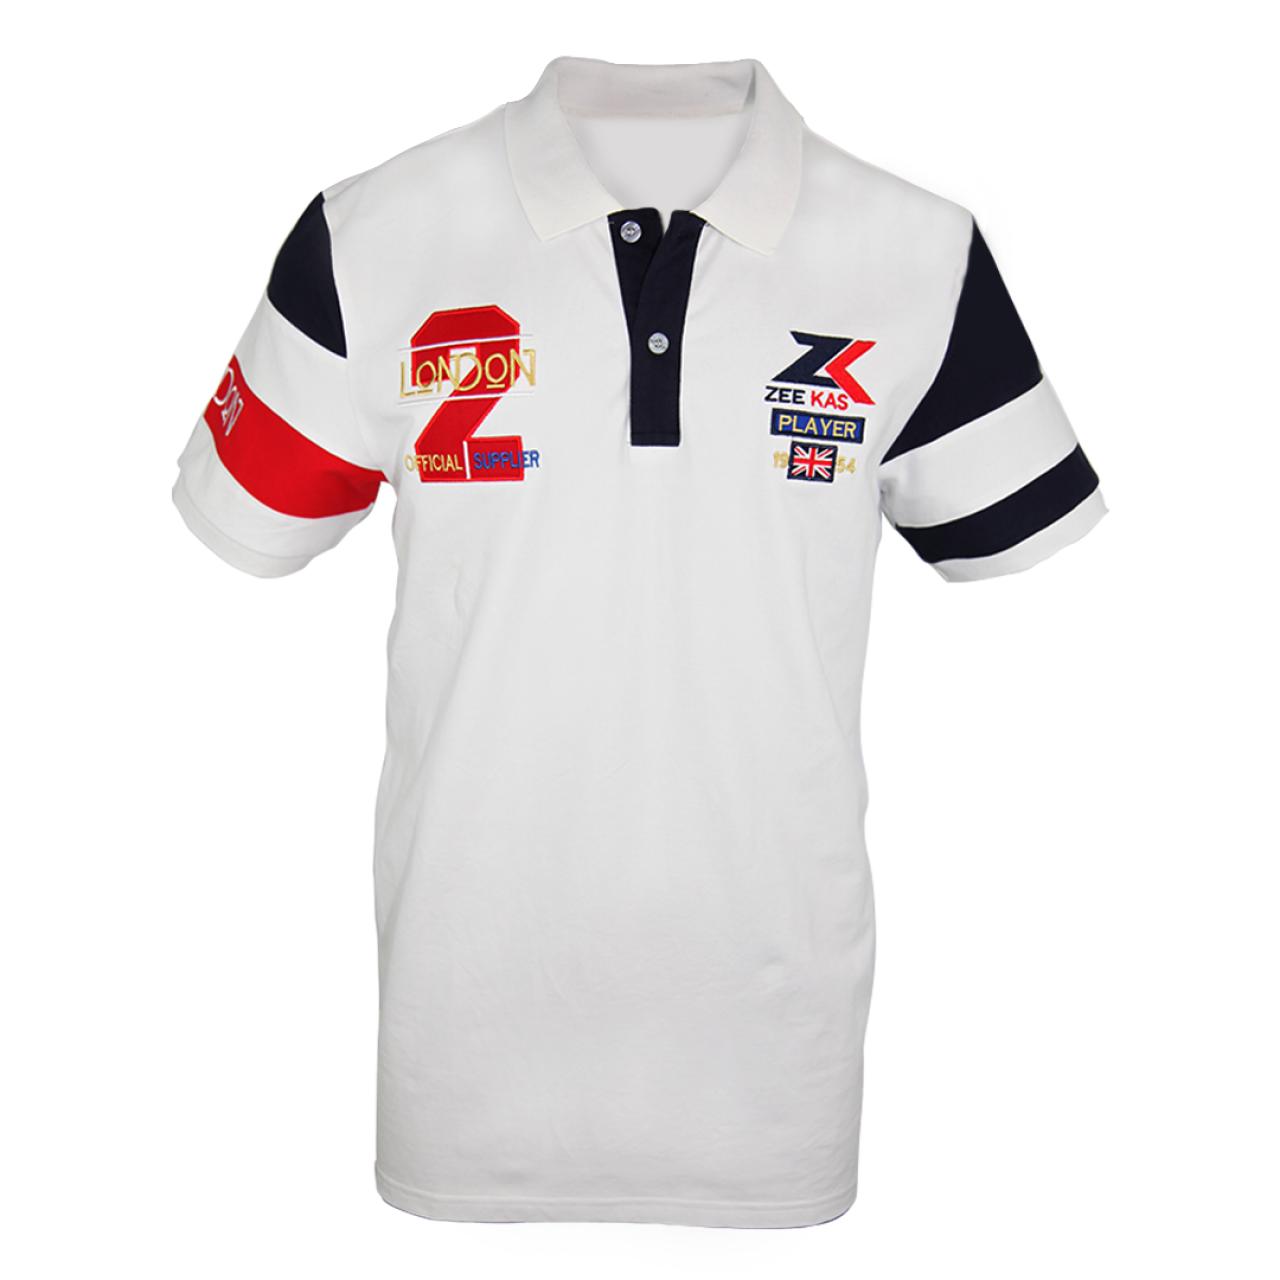 Zeekas Men's No.2 London Player Half Sleeves Polo Shirt